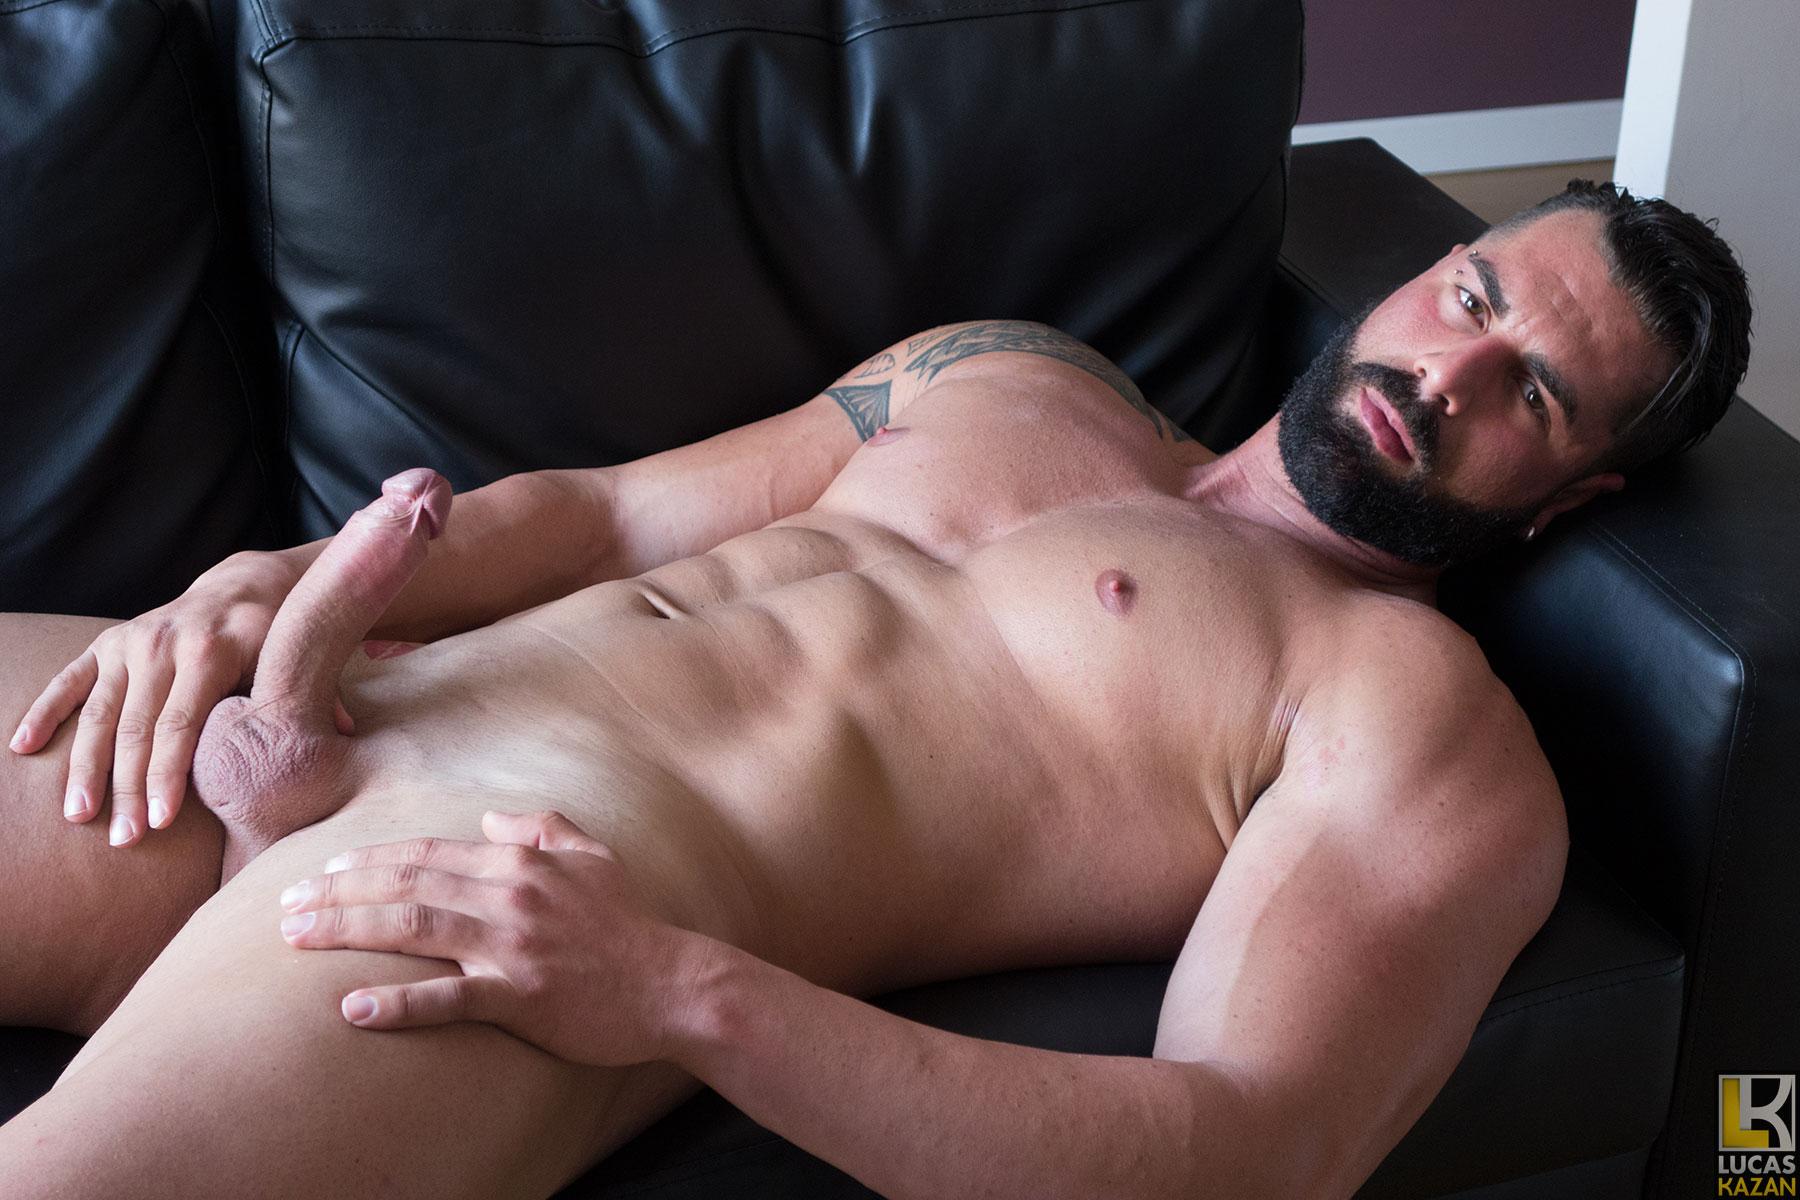 Apologise, gennaro brigante bodybuilder porn star images